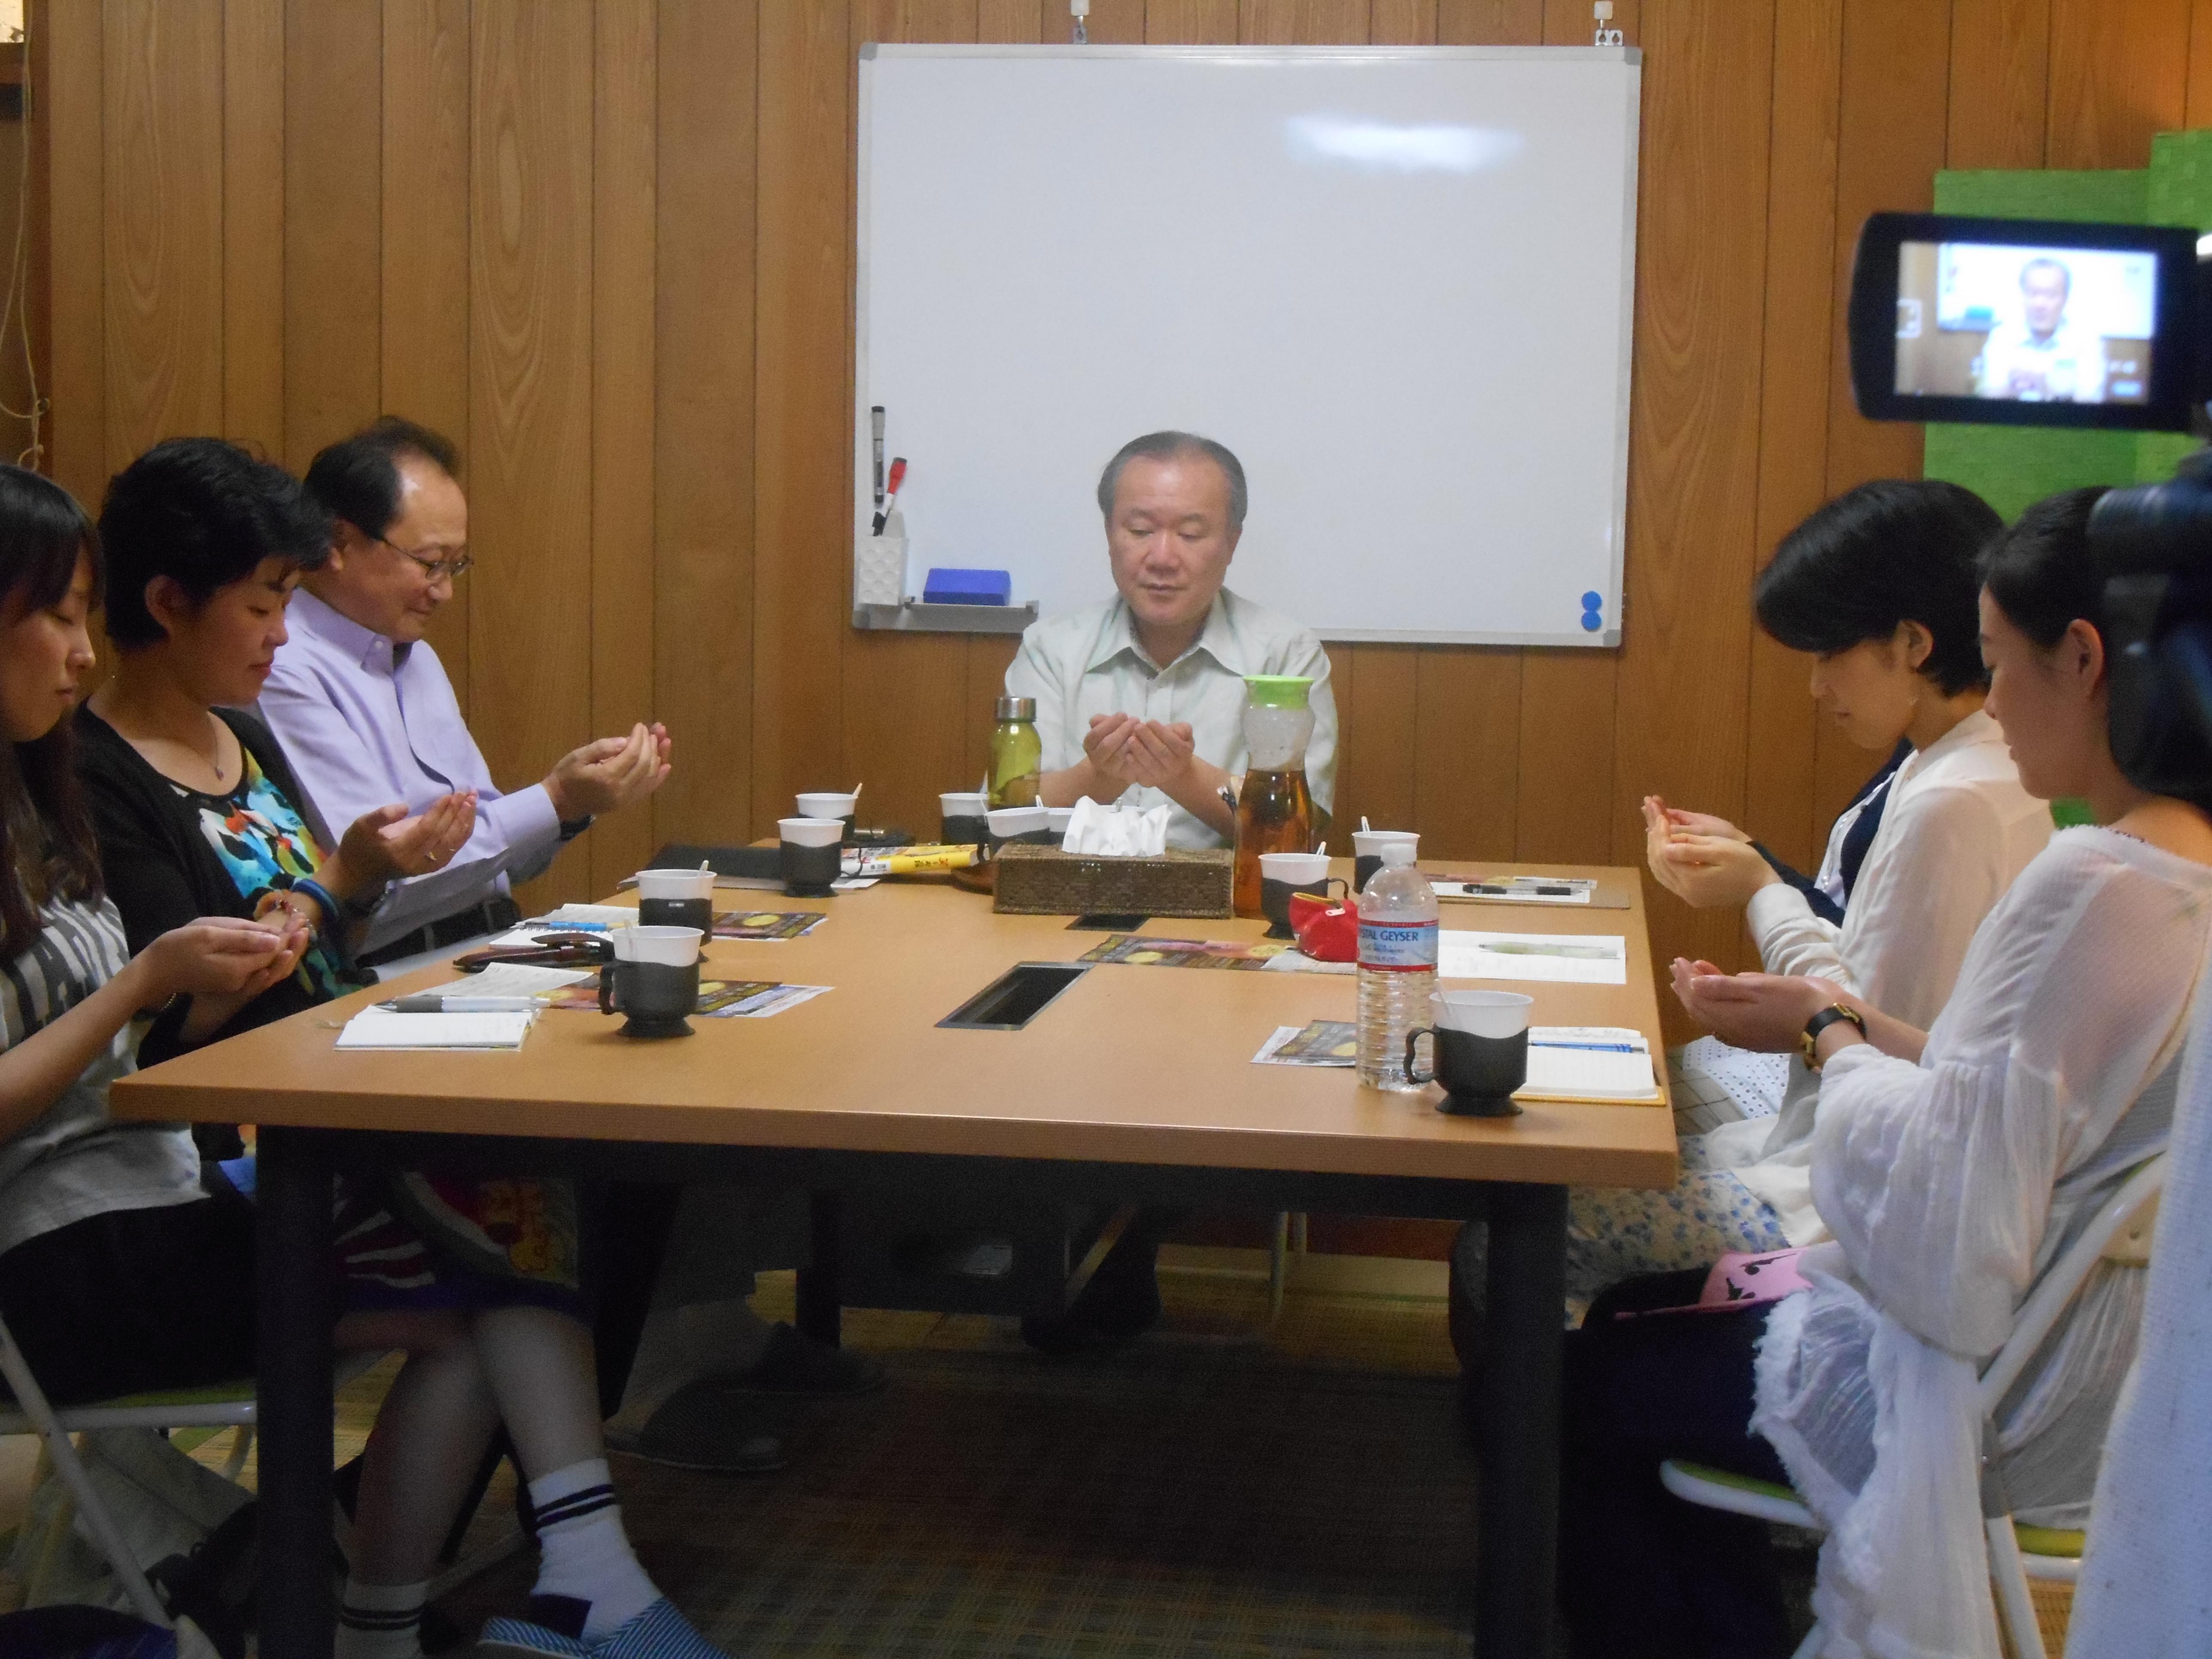 DSCN4884 - 池川先生から教えて頂いた令和の時代の生き方